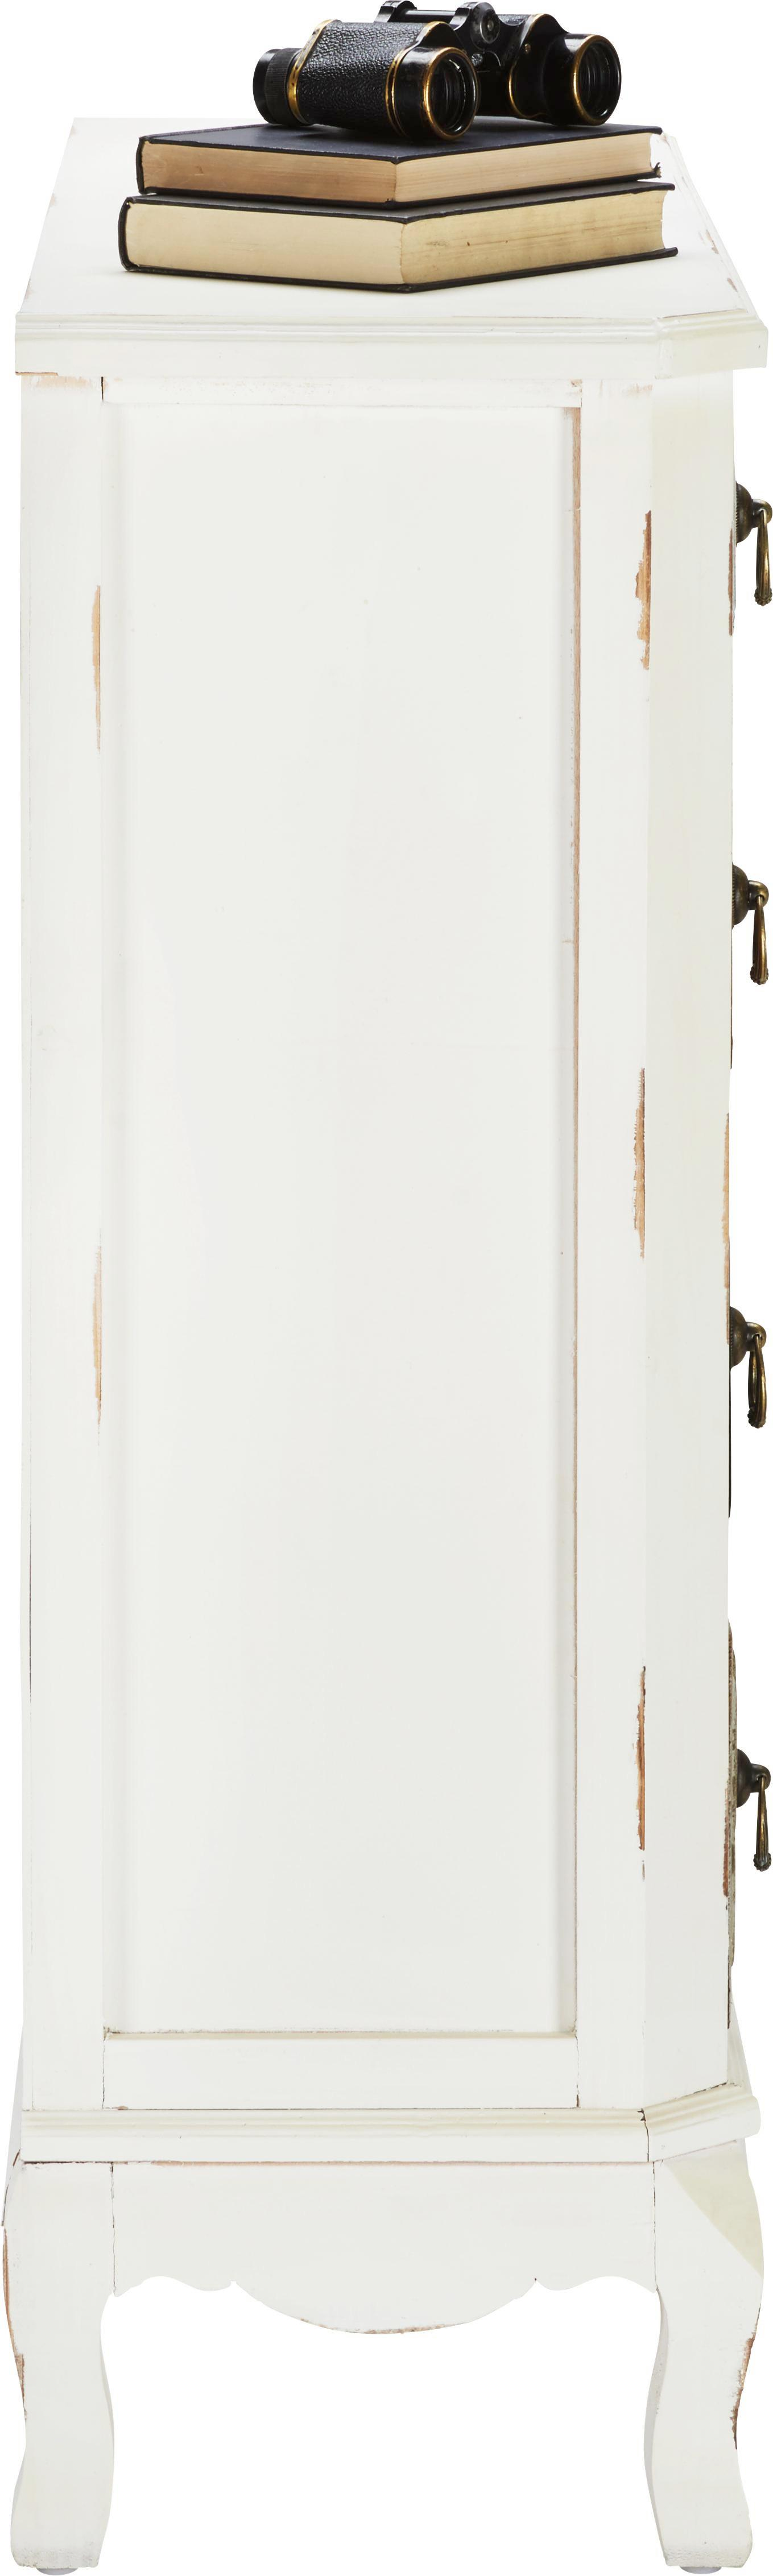 Kommode Florina - Schwarz/Braun, MODERN, Holz/Metall (101/95,5/31,5cm) - MÖMAX modern living